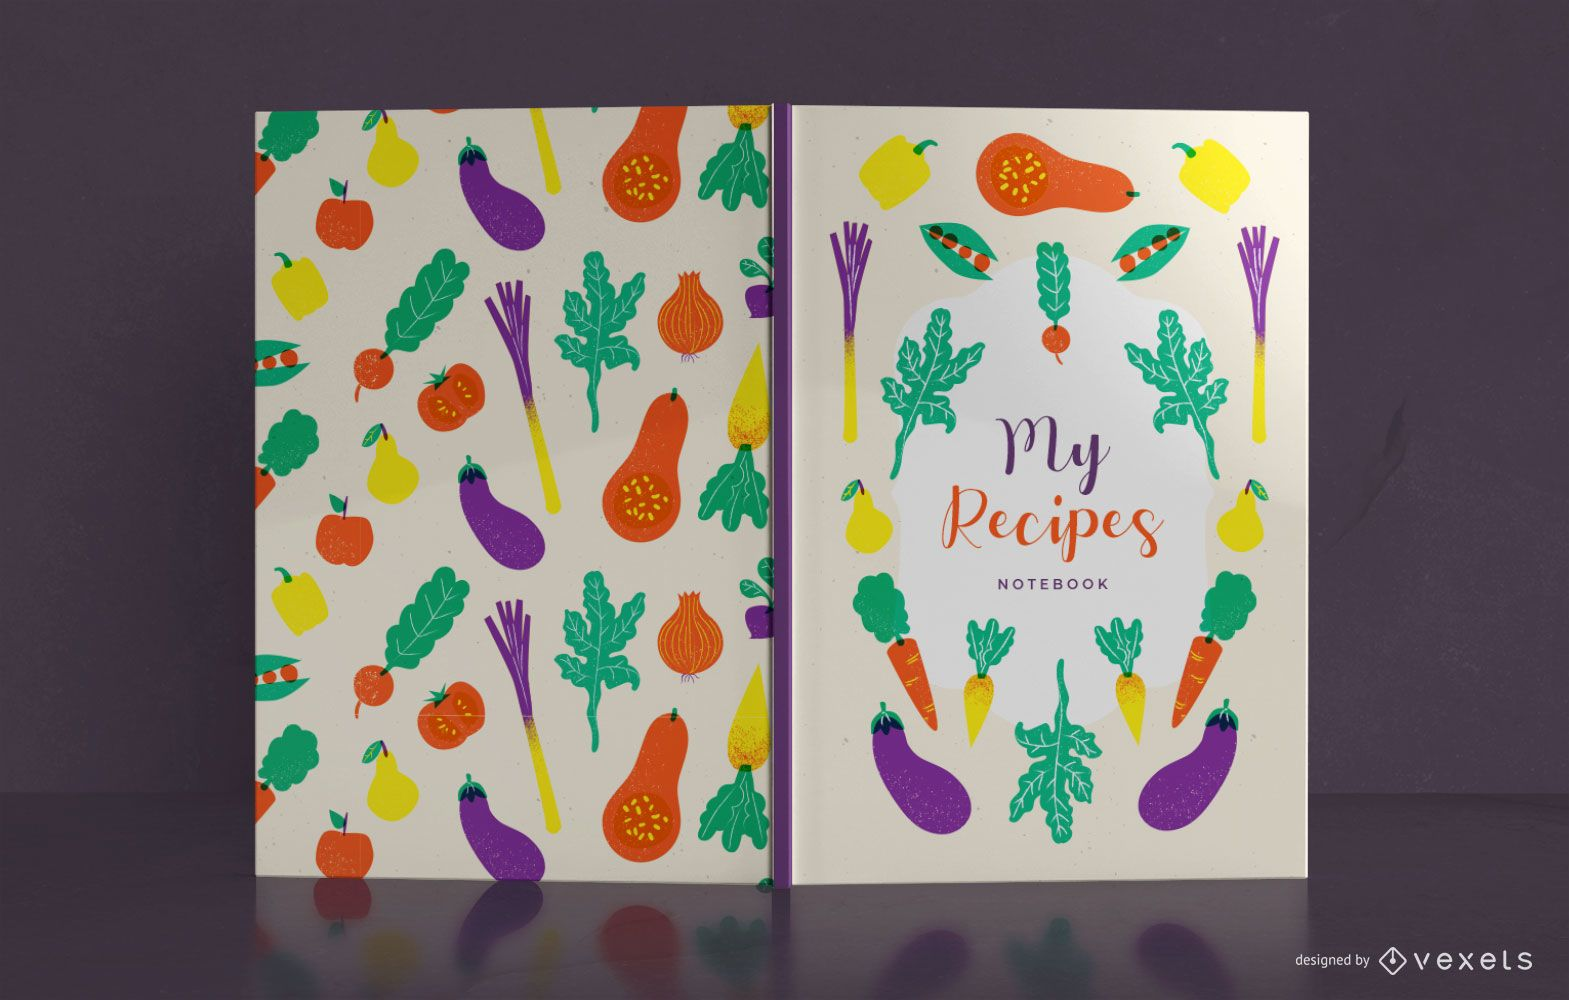 Vegetables Recipe Book Cover Design